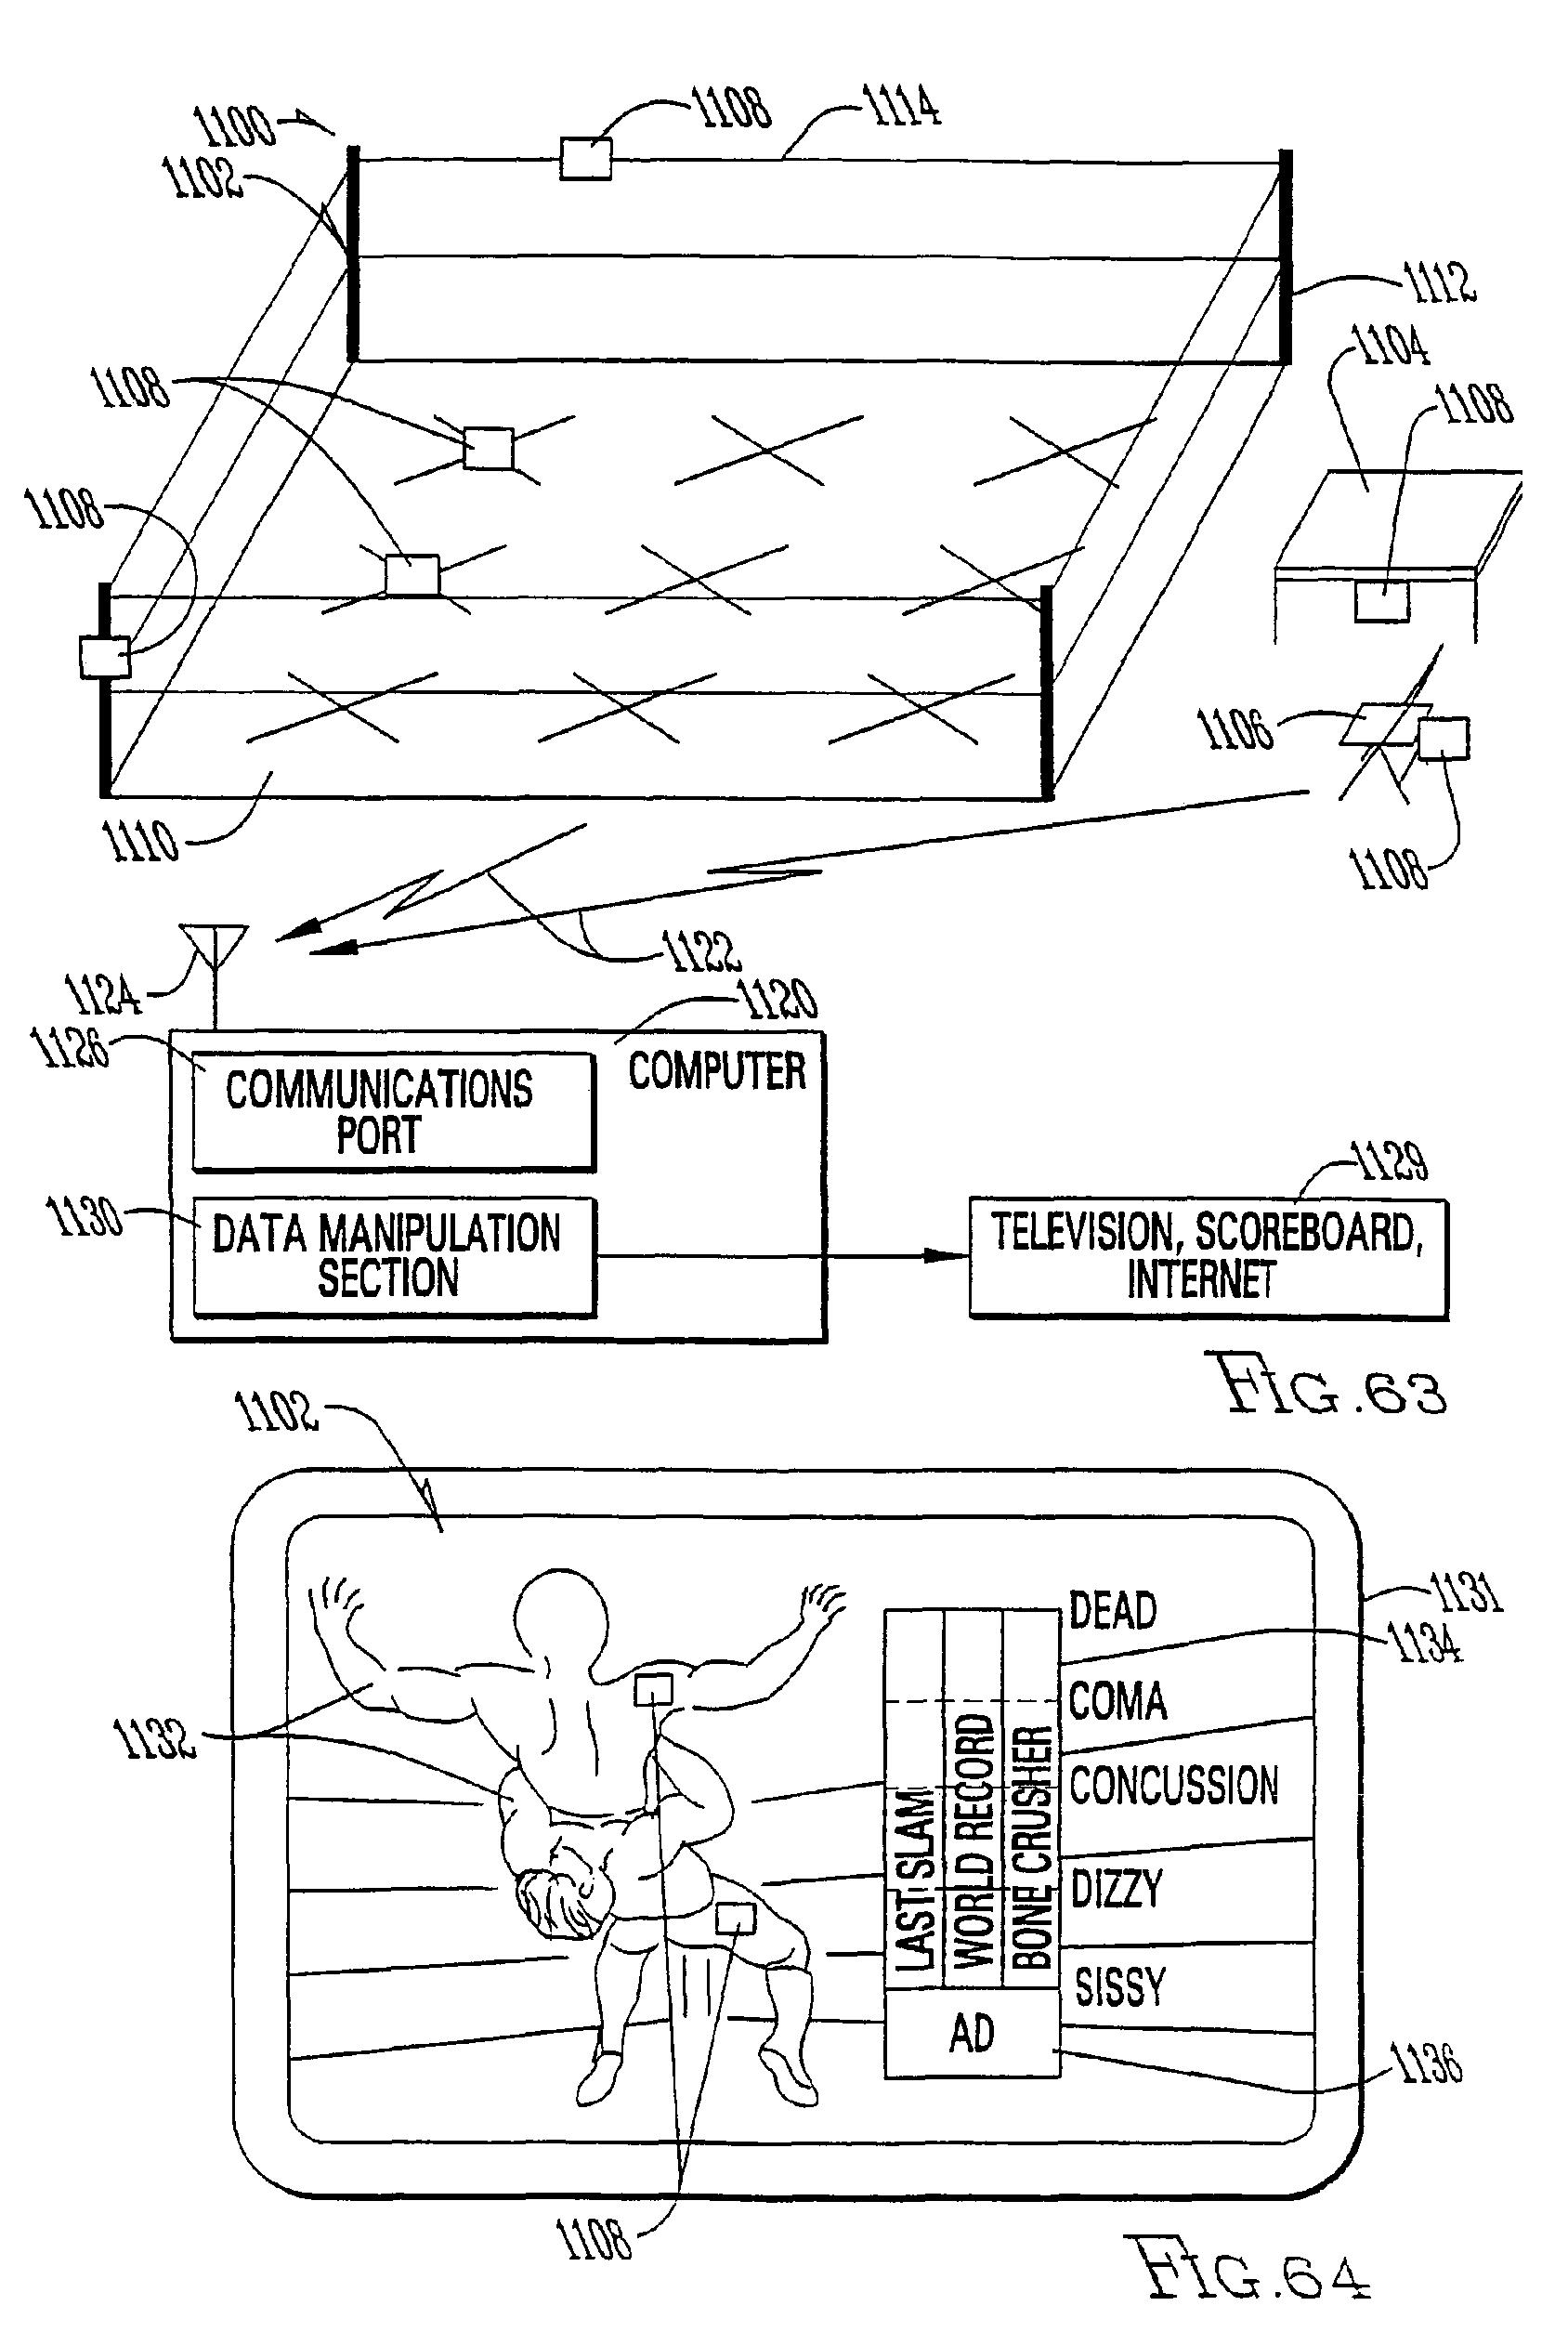 Ignition Switch Wiring Diagram Craftsman 1136. . Wiring Diagram on